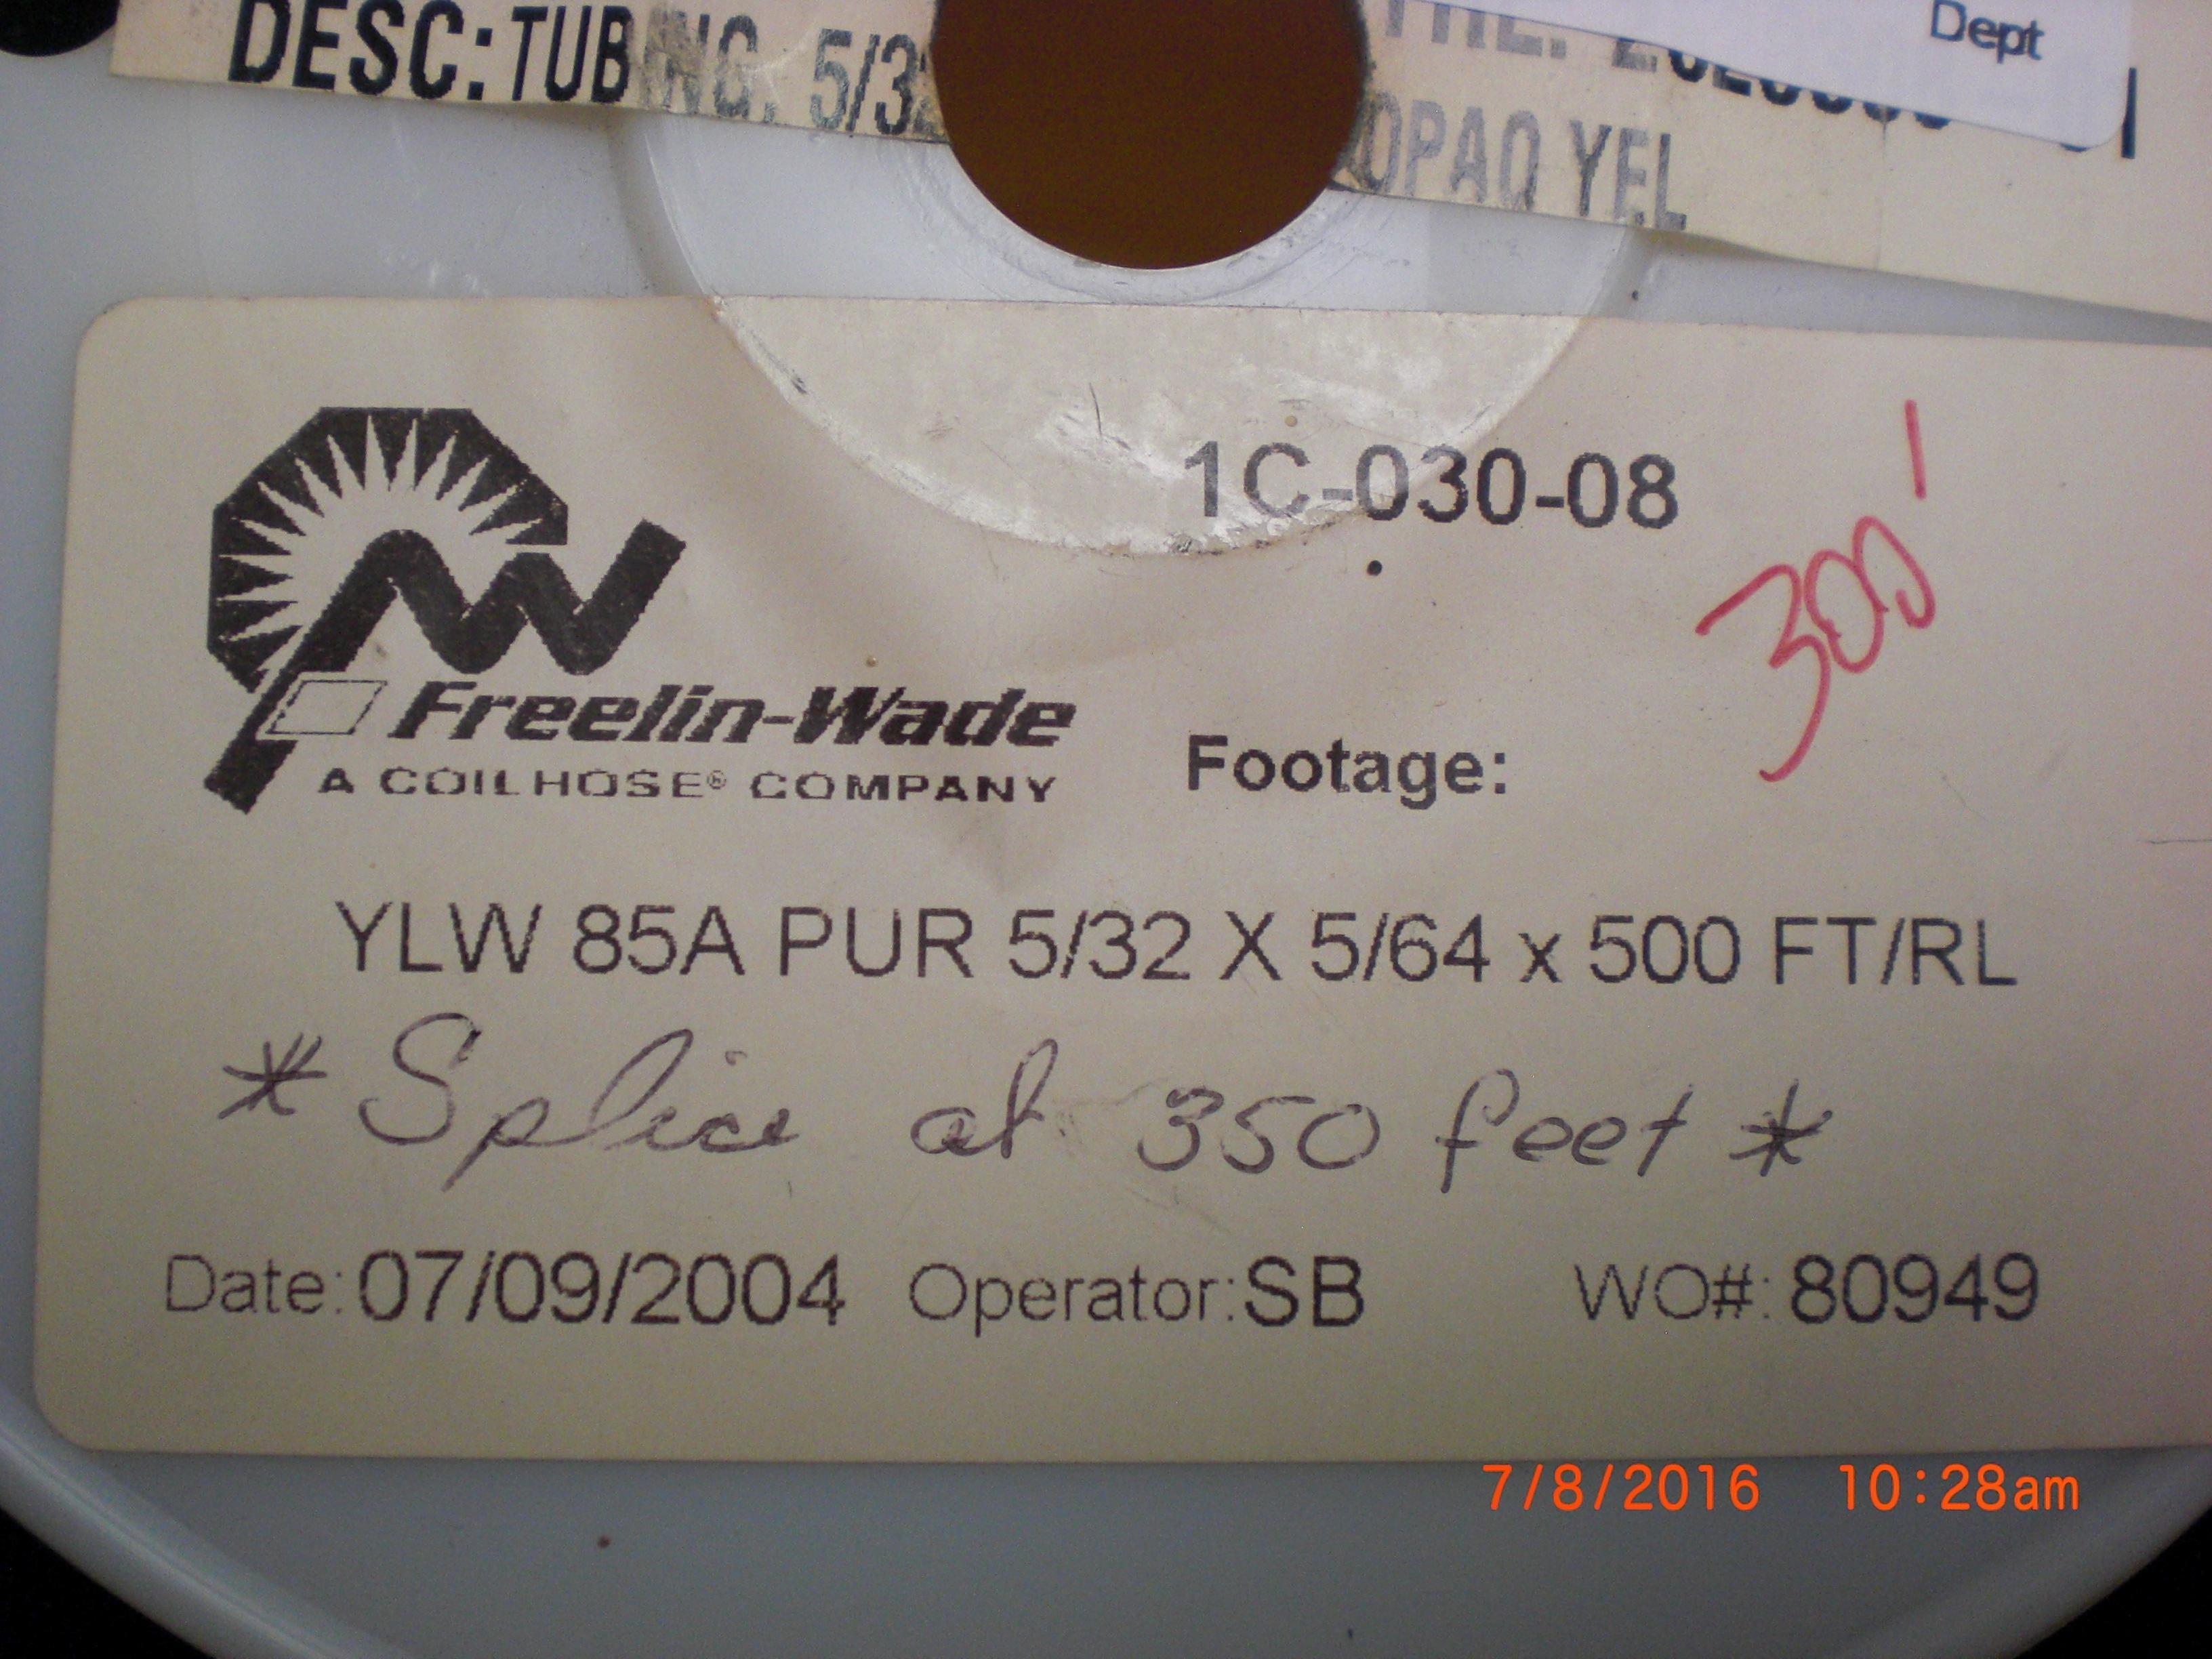 Tubing 300ft Yellow Polyurethane  85A PUR 5/32 x 5/64 FREELIN-WADE 1C-030-08